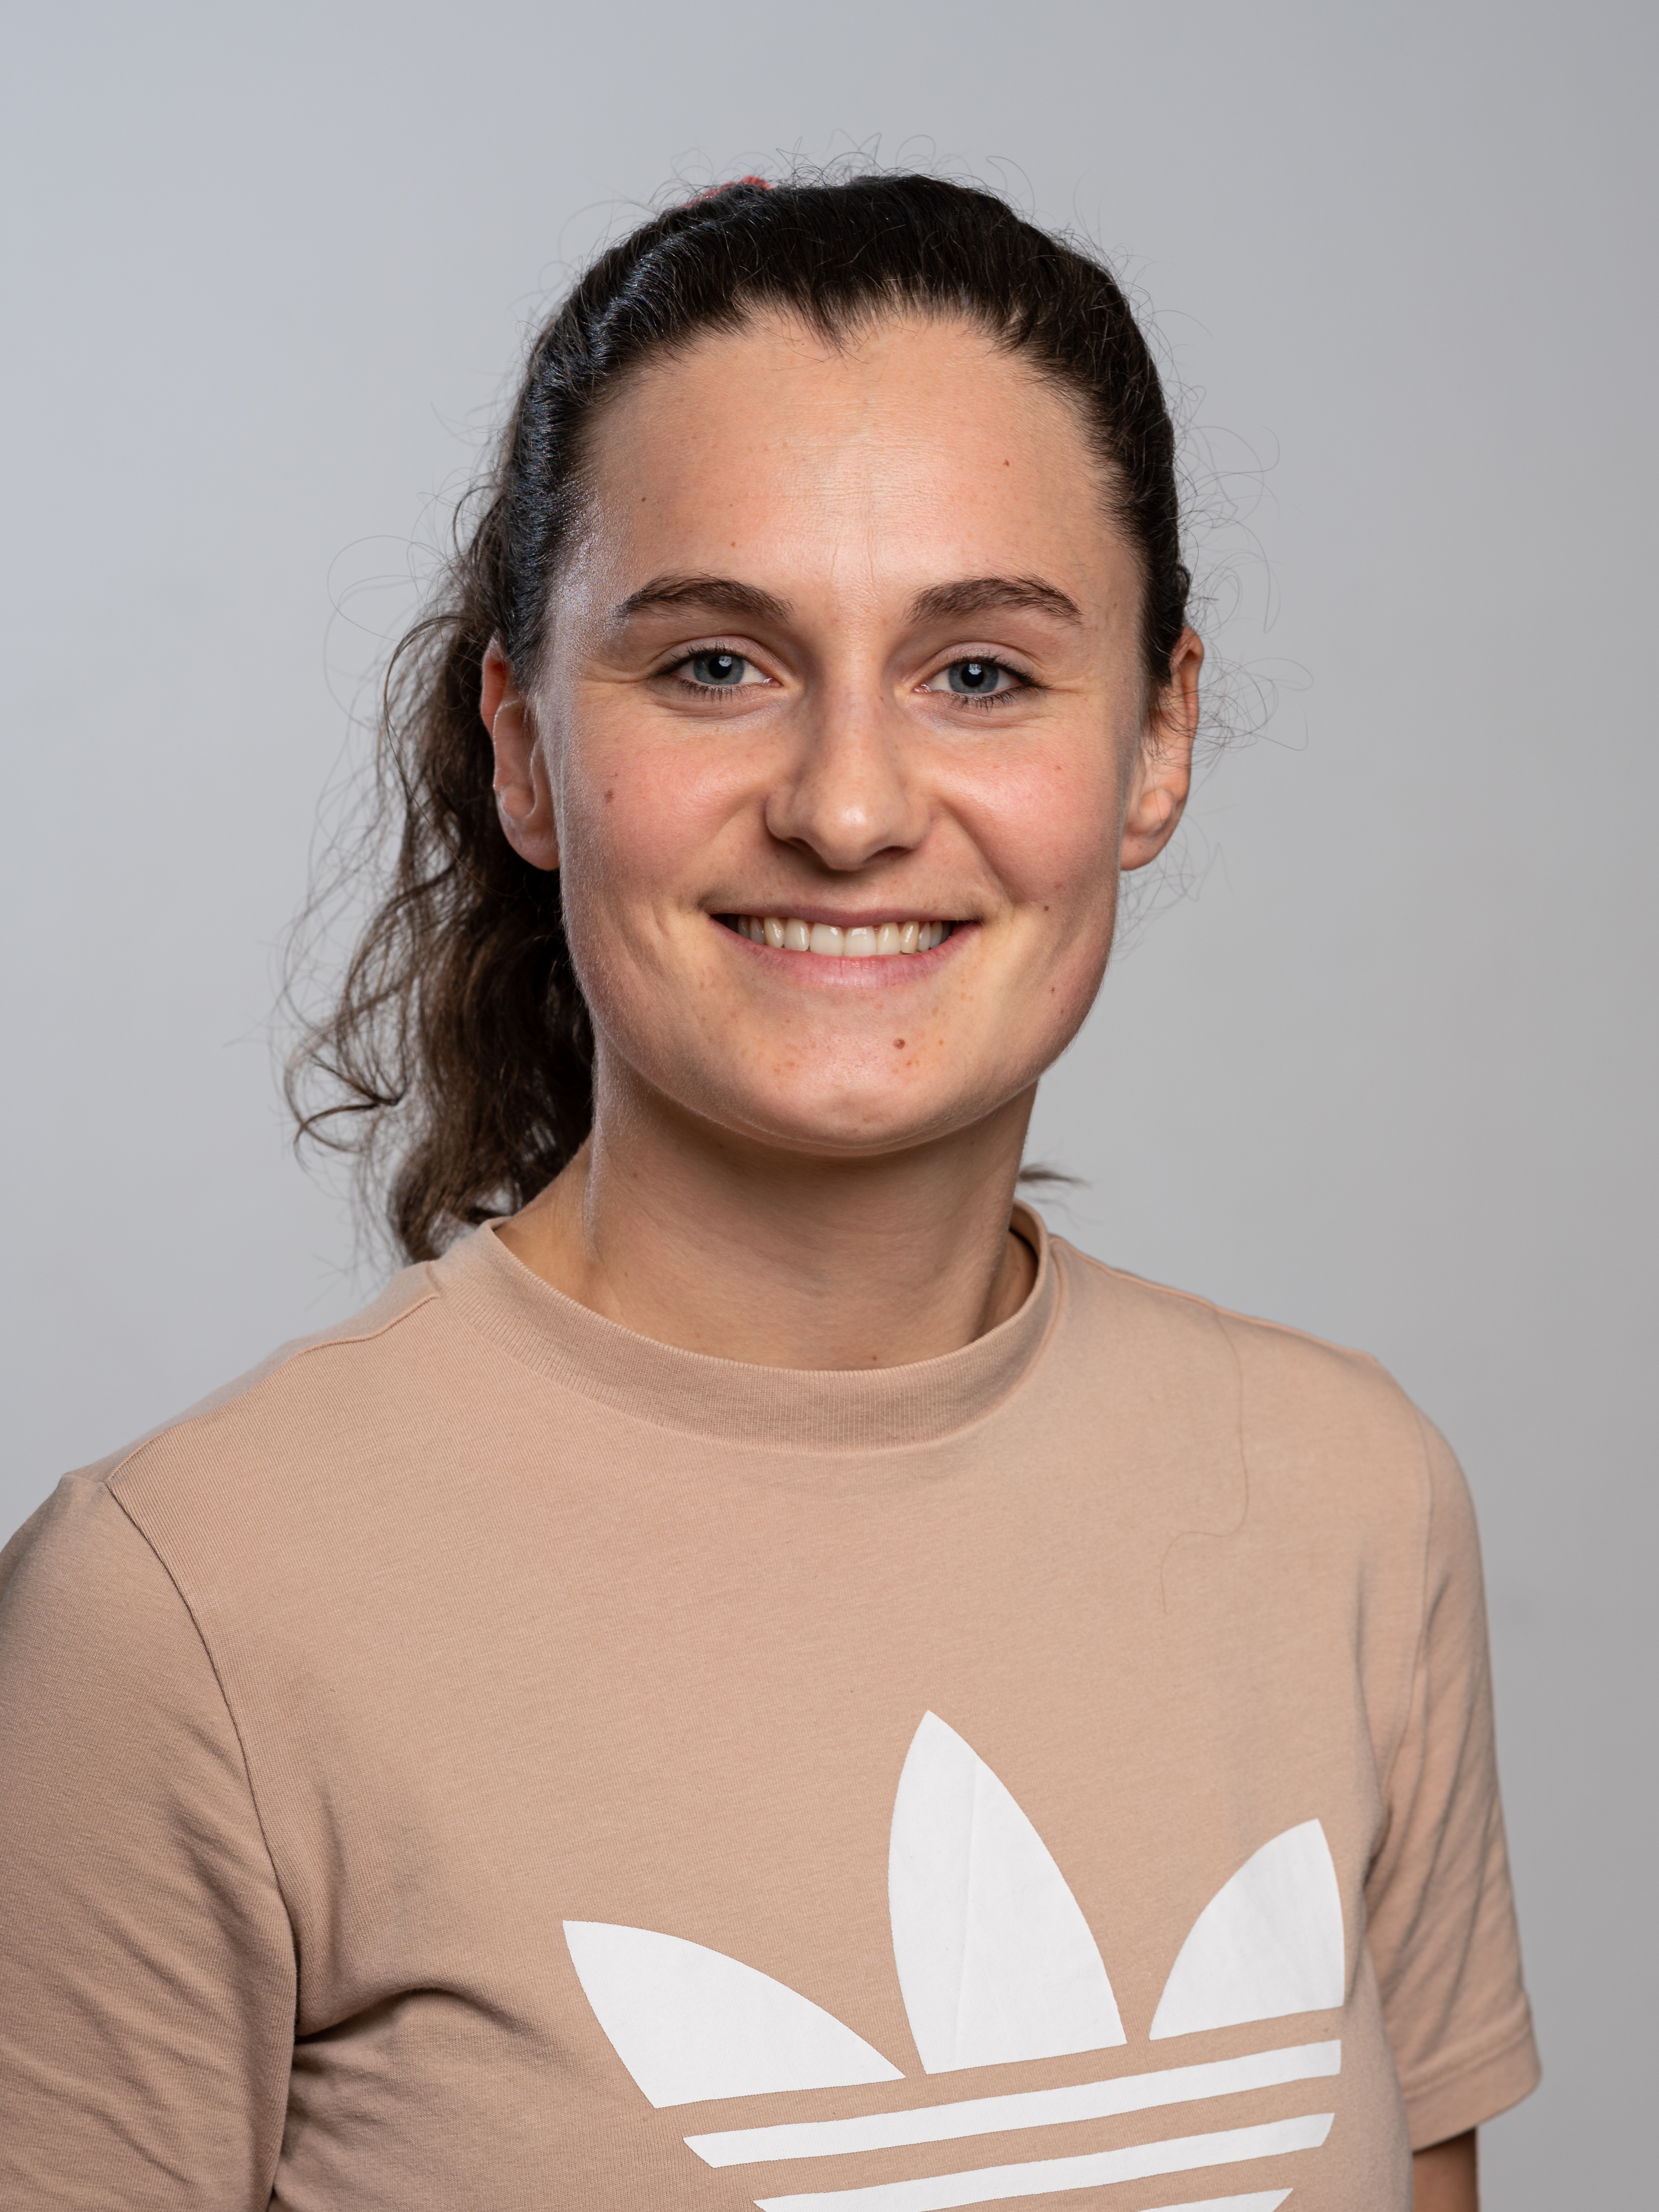 Josephine Hedegaard